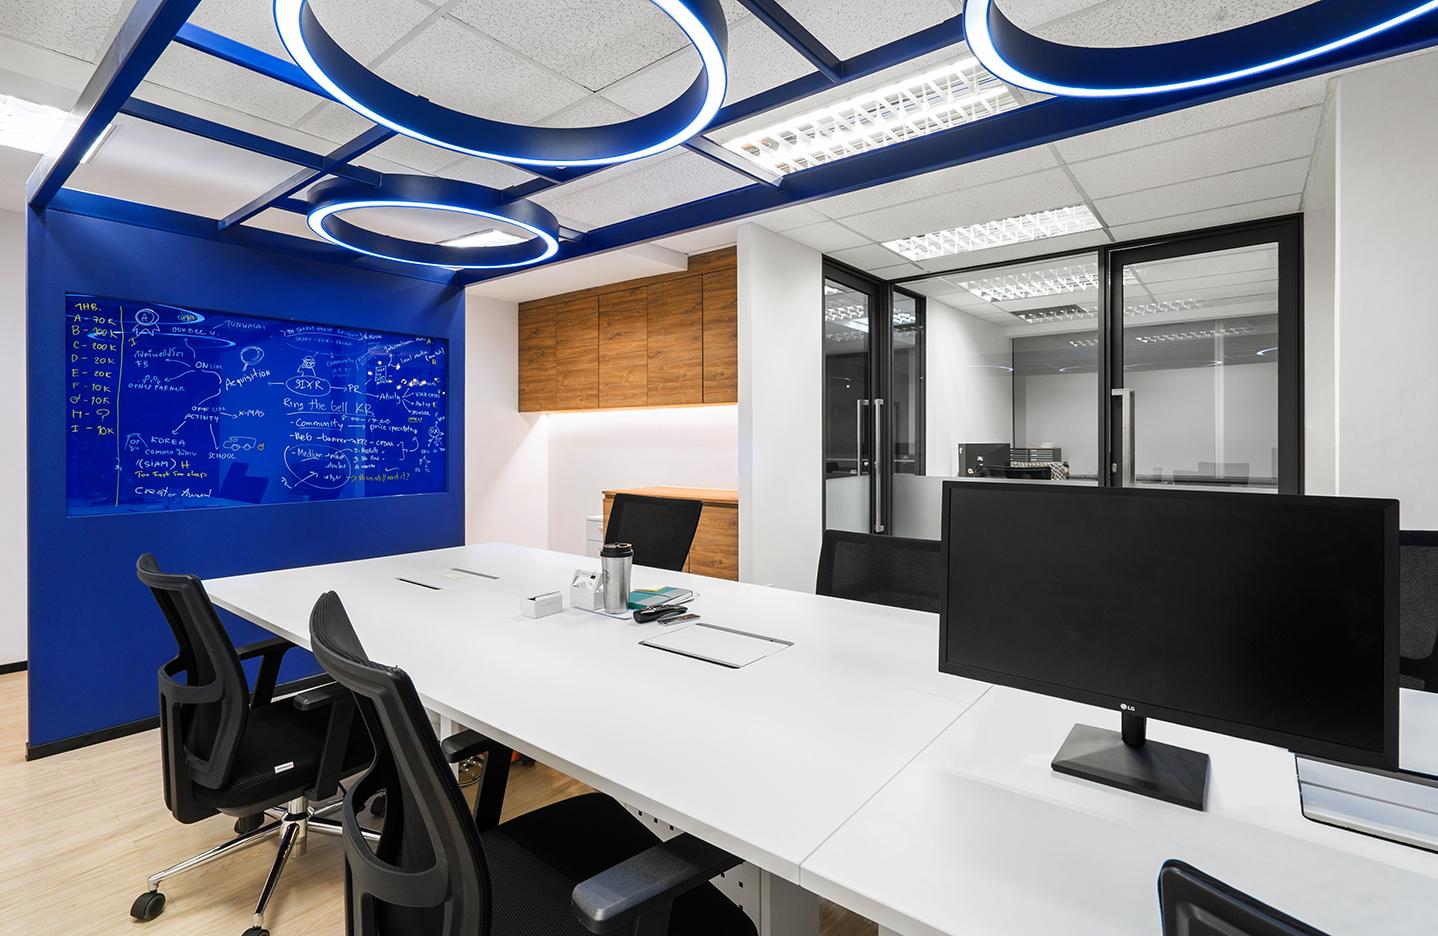 six network office 10 design 12